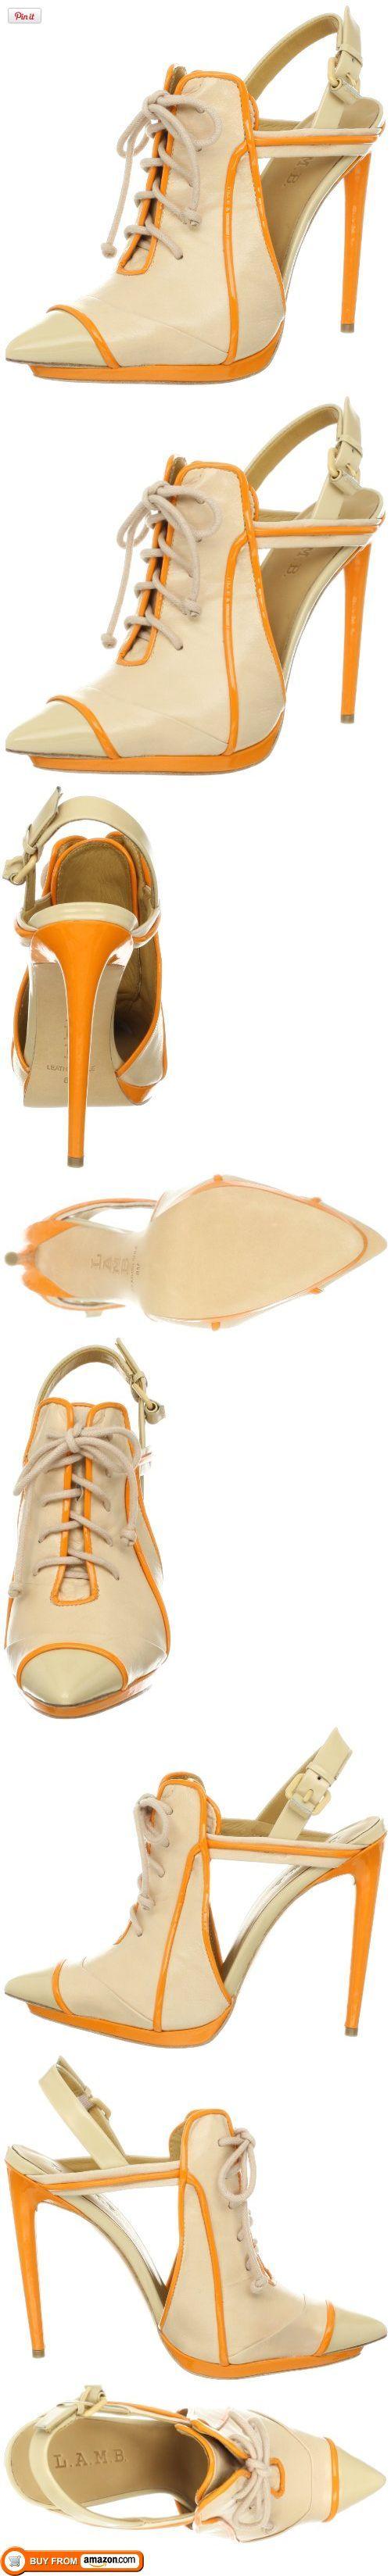 L.A.M.B shirt | Women's Janetta Oxford,Naked/Orange,6 M US, , #Apparel, # ...